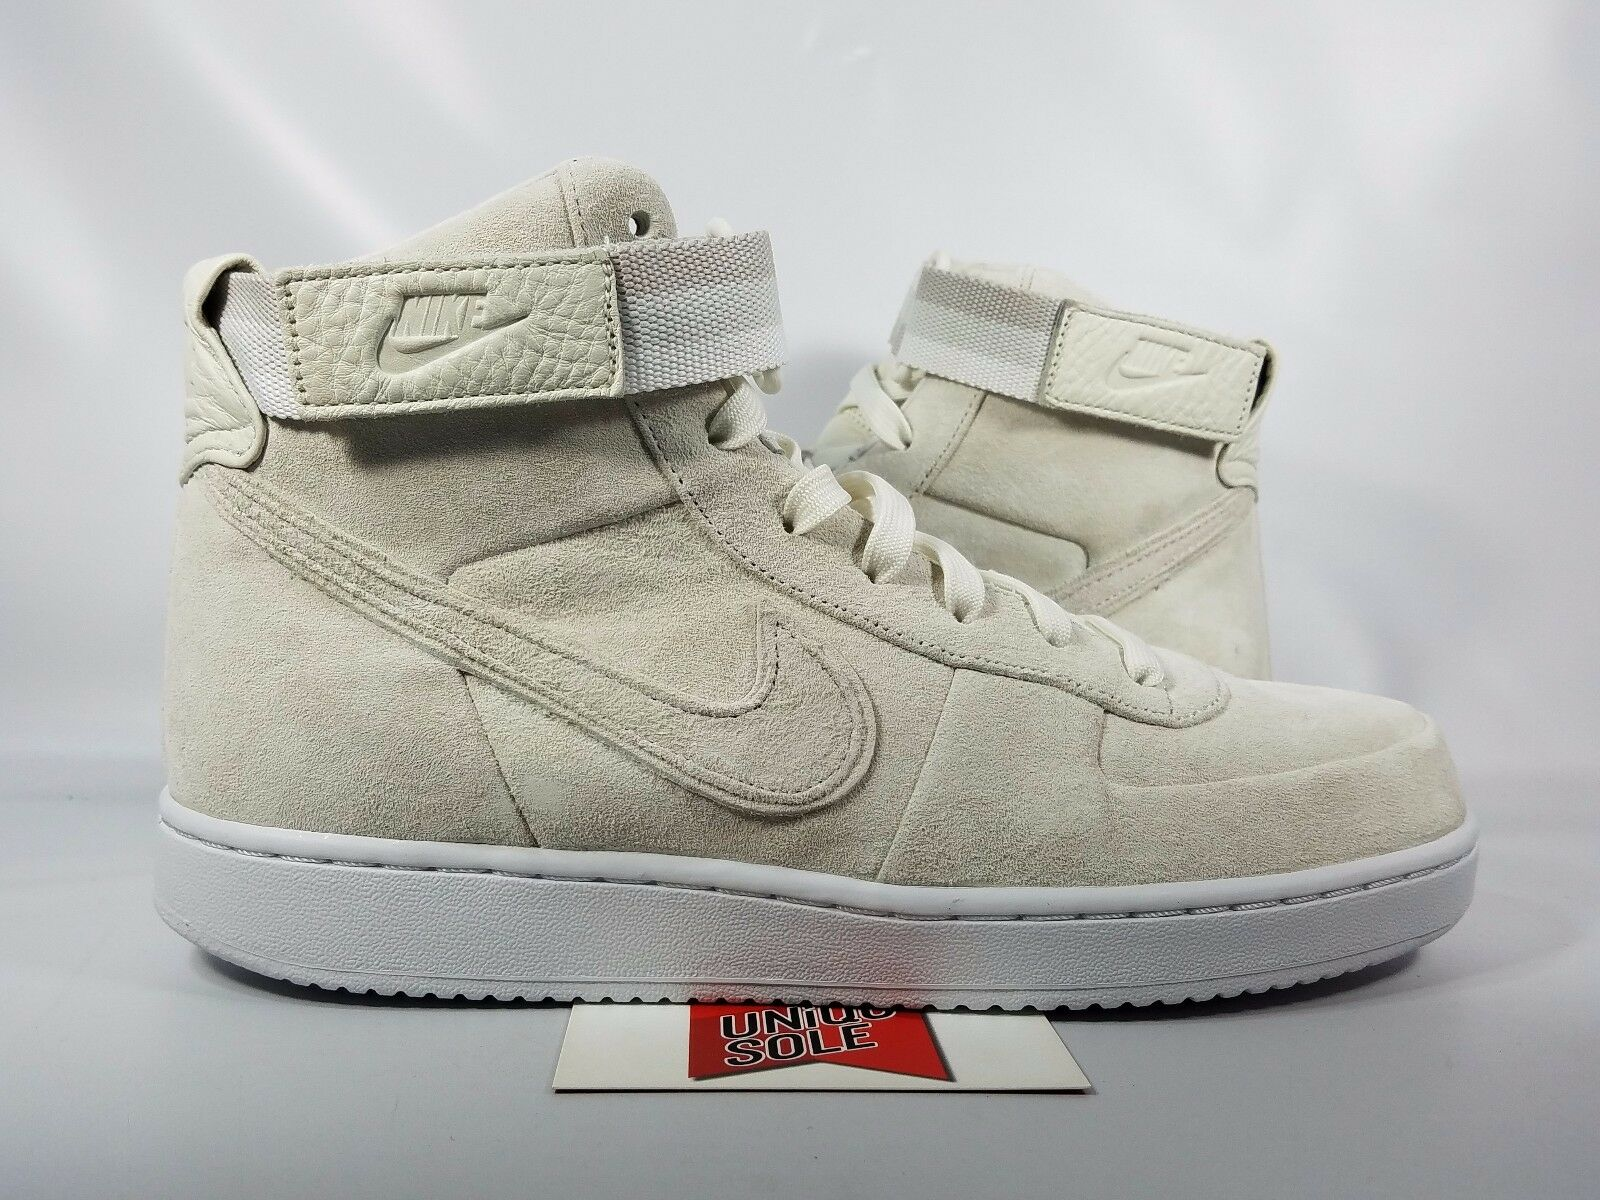 Nike Vandal SUEDE High JOHN ELLIOTT NIKELAB SAIL WHITE SUEDE Vandal AH7171-101 sz 10.5 5d6fa4